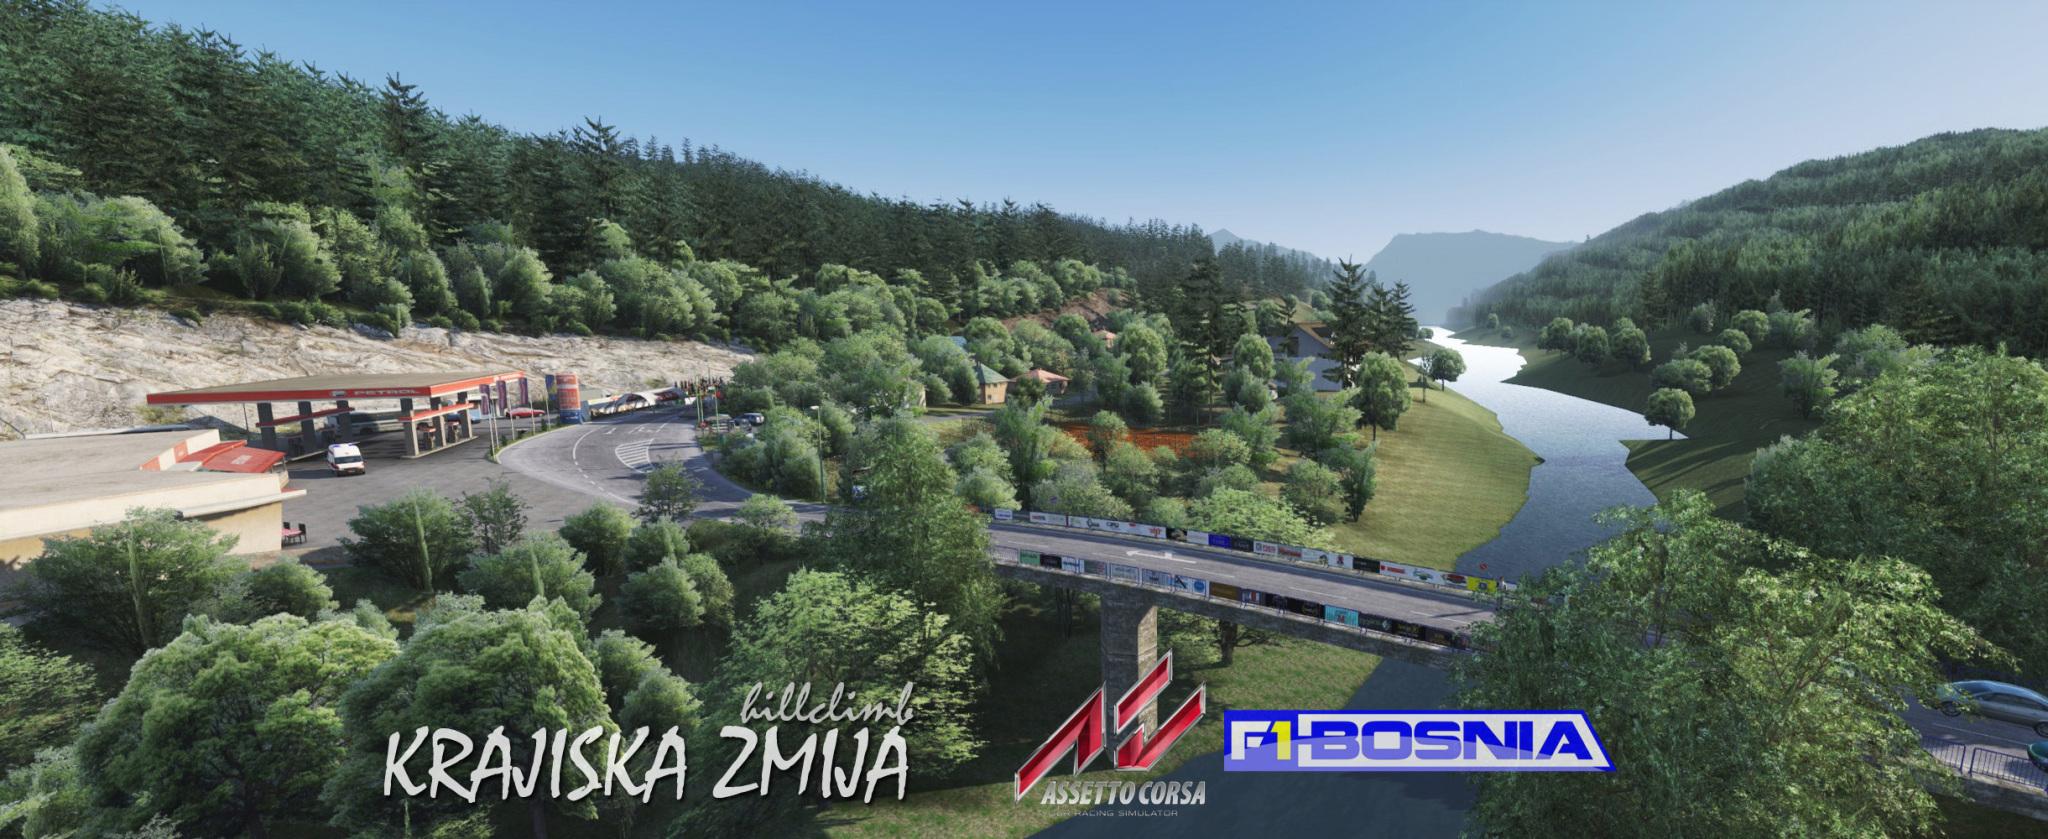 Krajiska Zmija Hillclimb - Assetto Corsa Mods